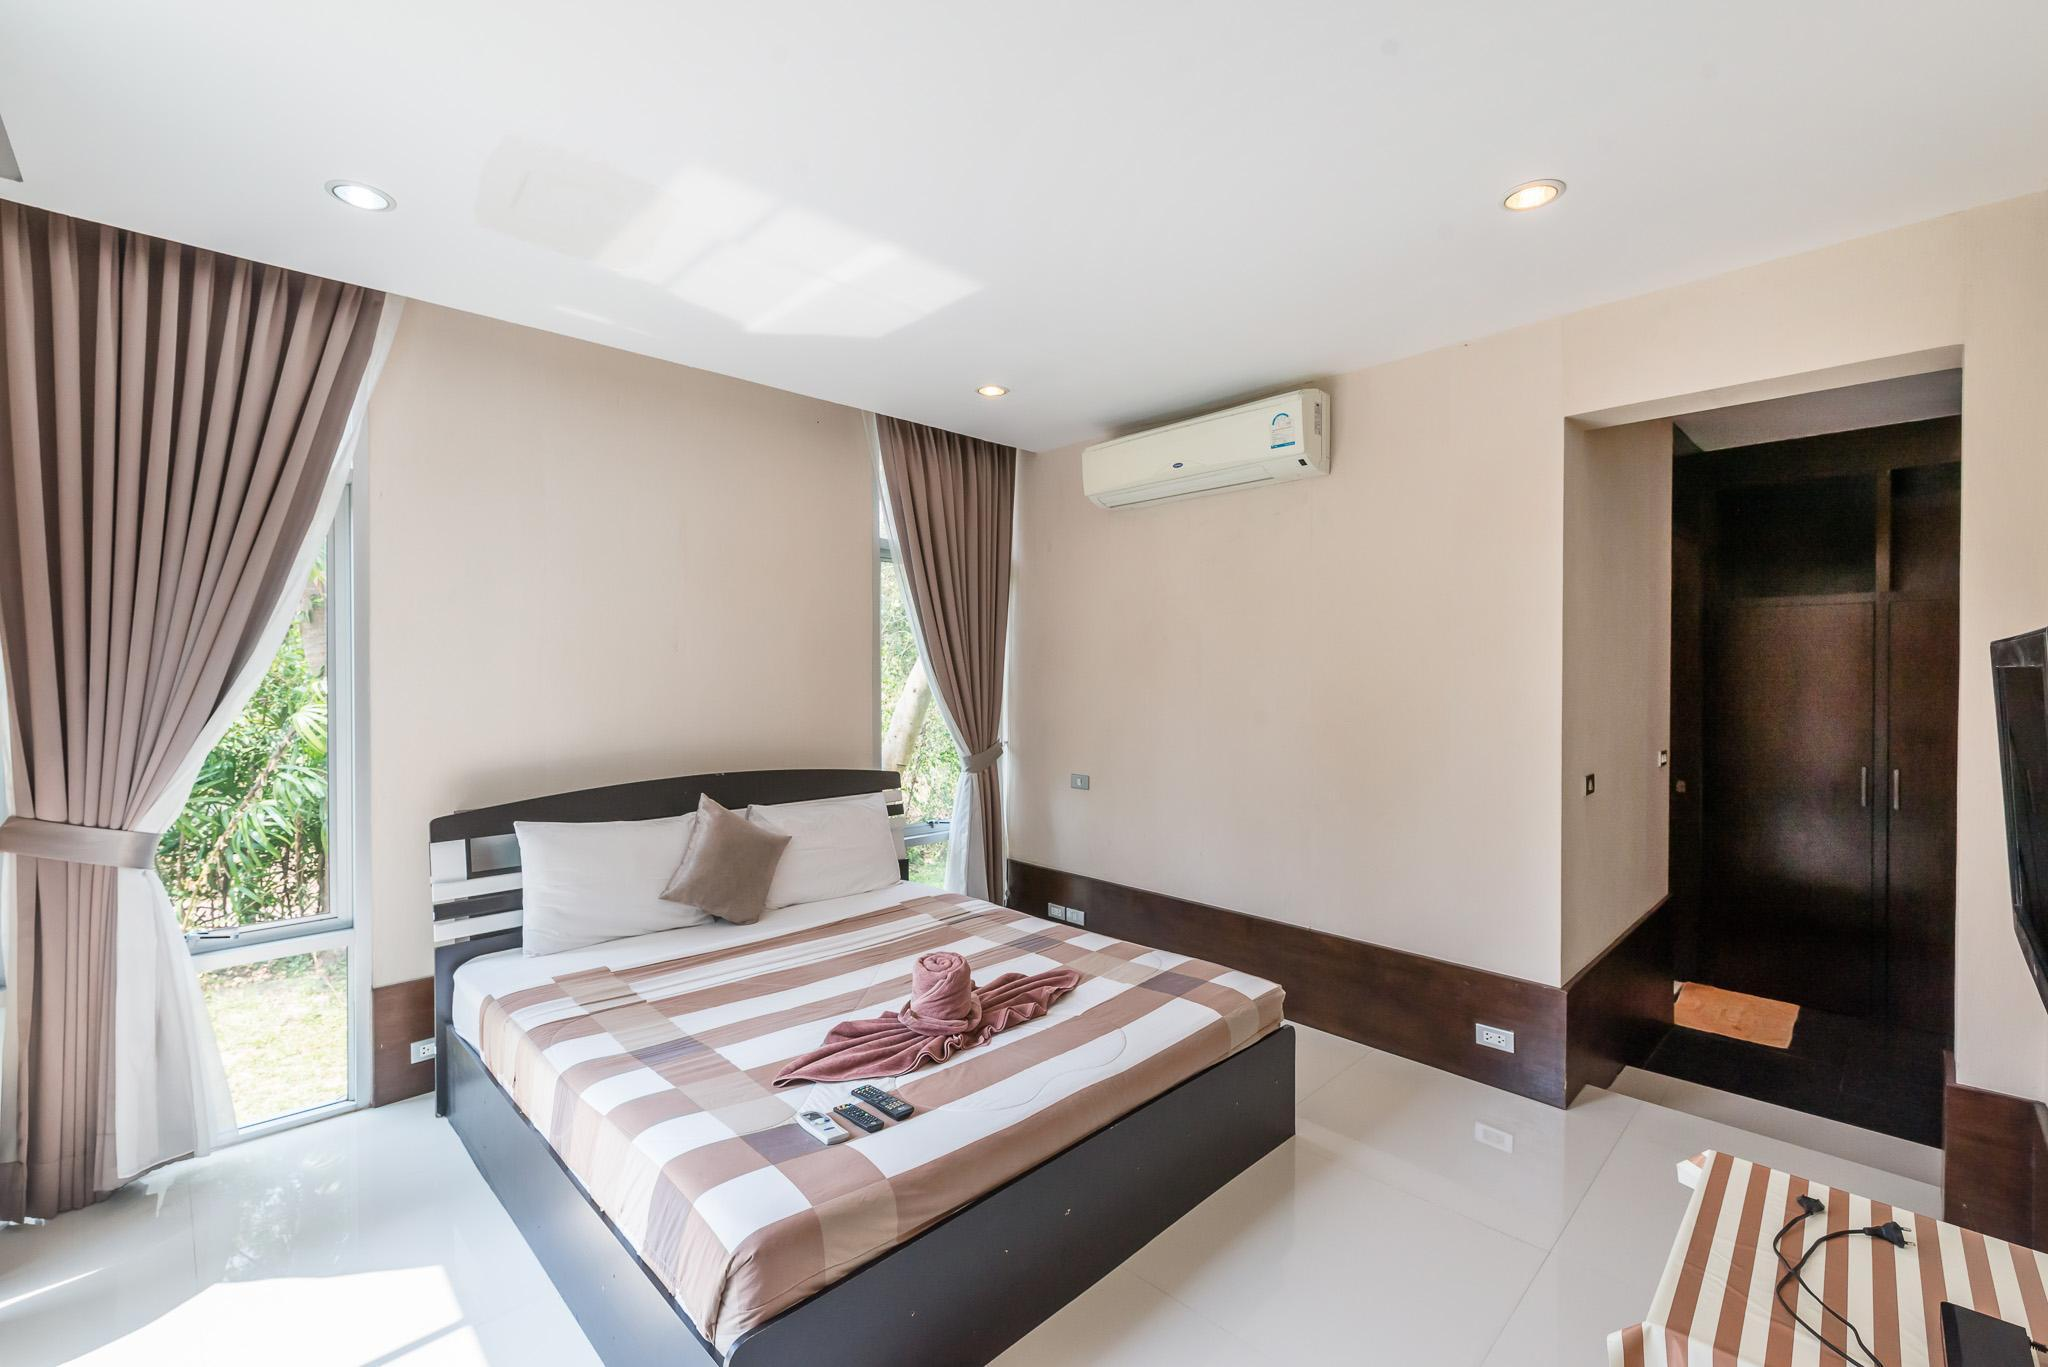 Wana Poolvilla 5BR+6Bath in Pattaya วิลลา 5 ห้องนอน 6 ห้องน้ำส่วนตัว ขนาด 600 ตร.ม. – เขาตาโล